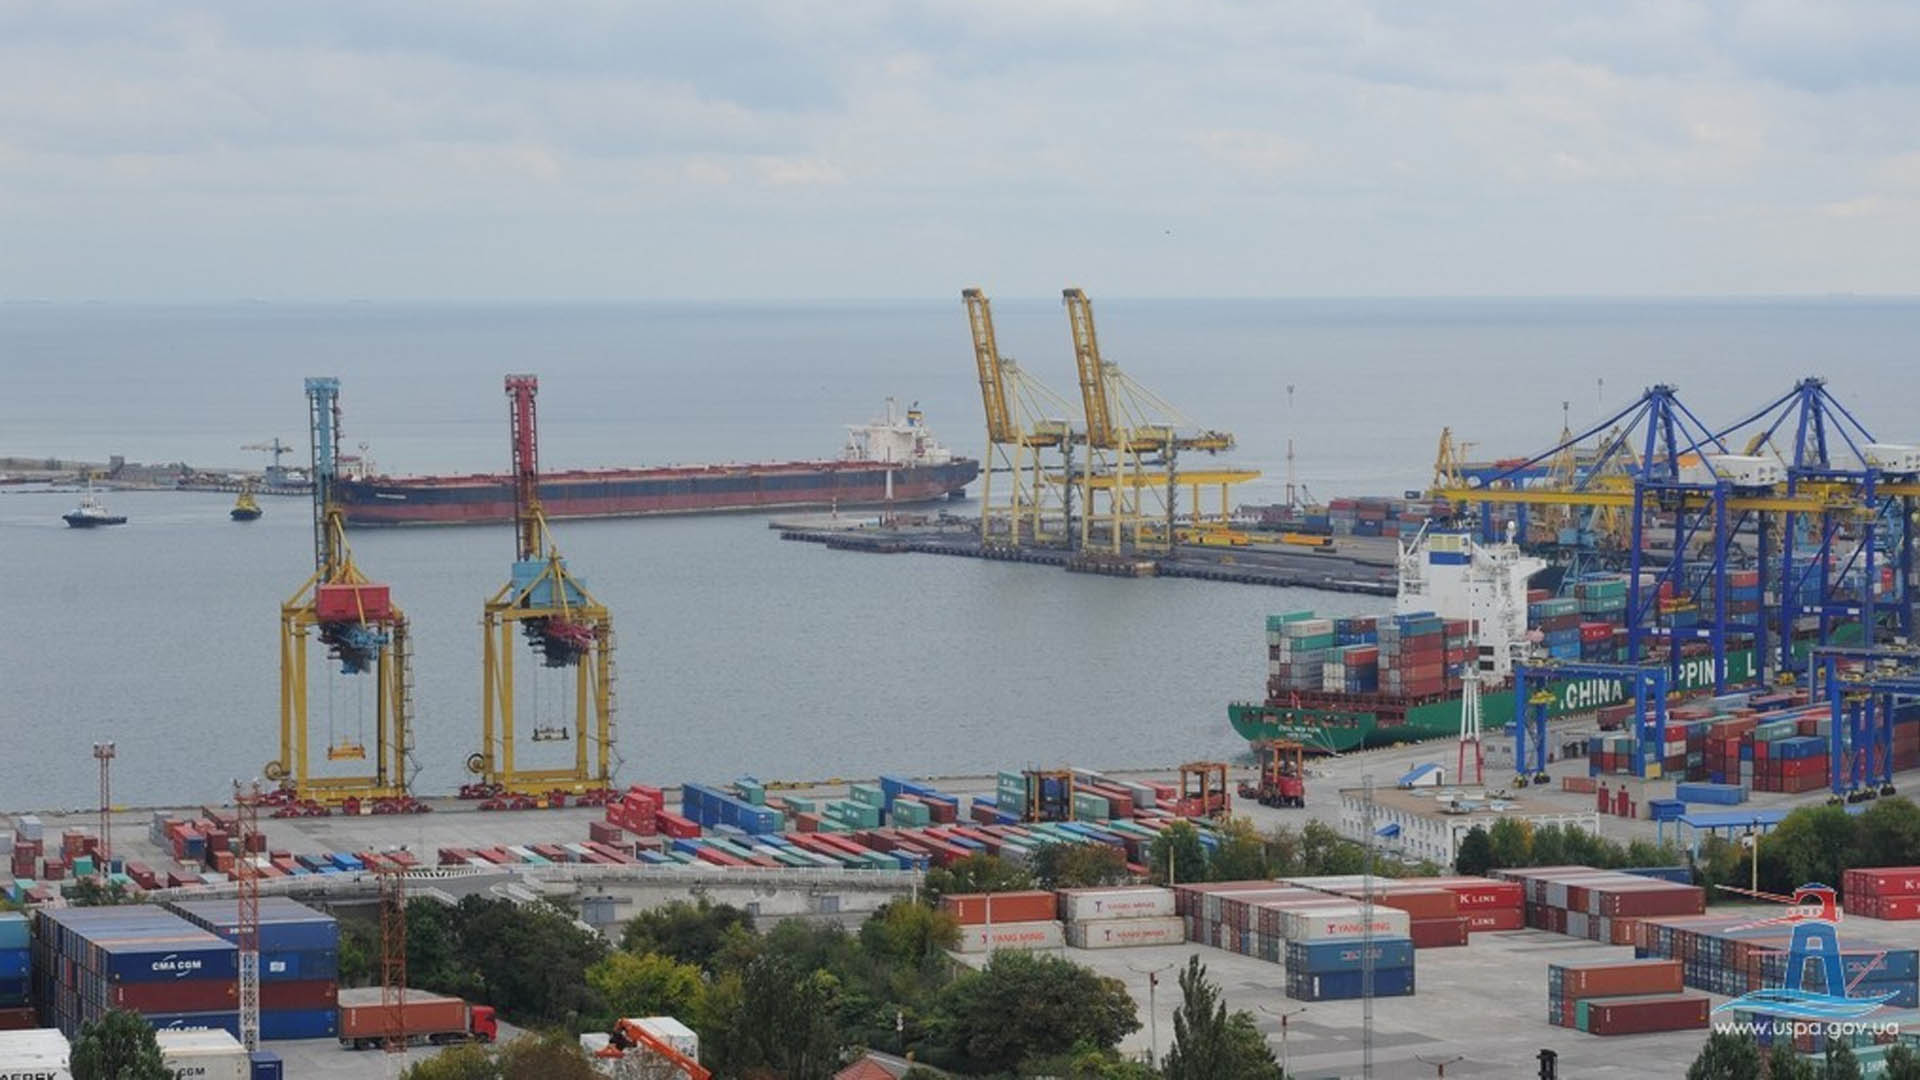 Ukrainian Port of Chornomorsk Getting New Grain Terminal, Additional Berths